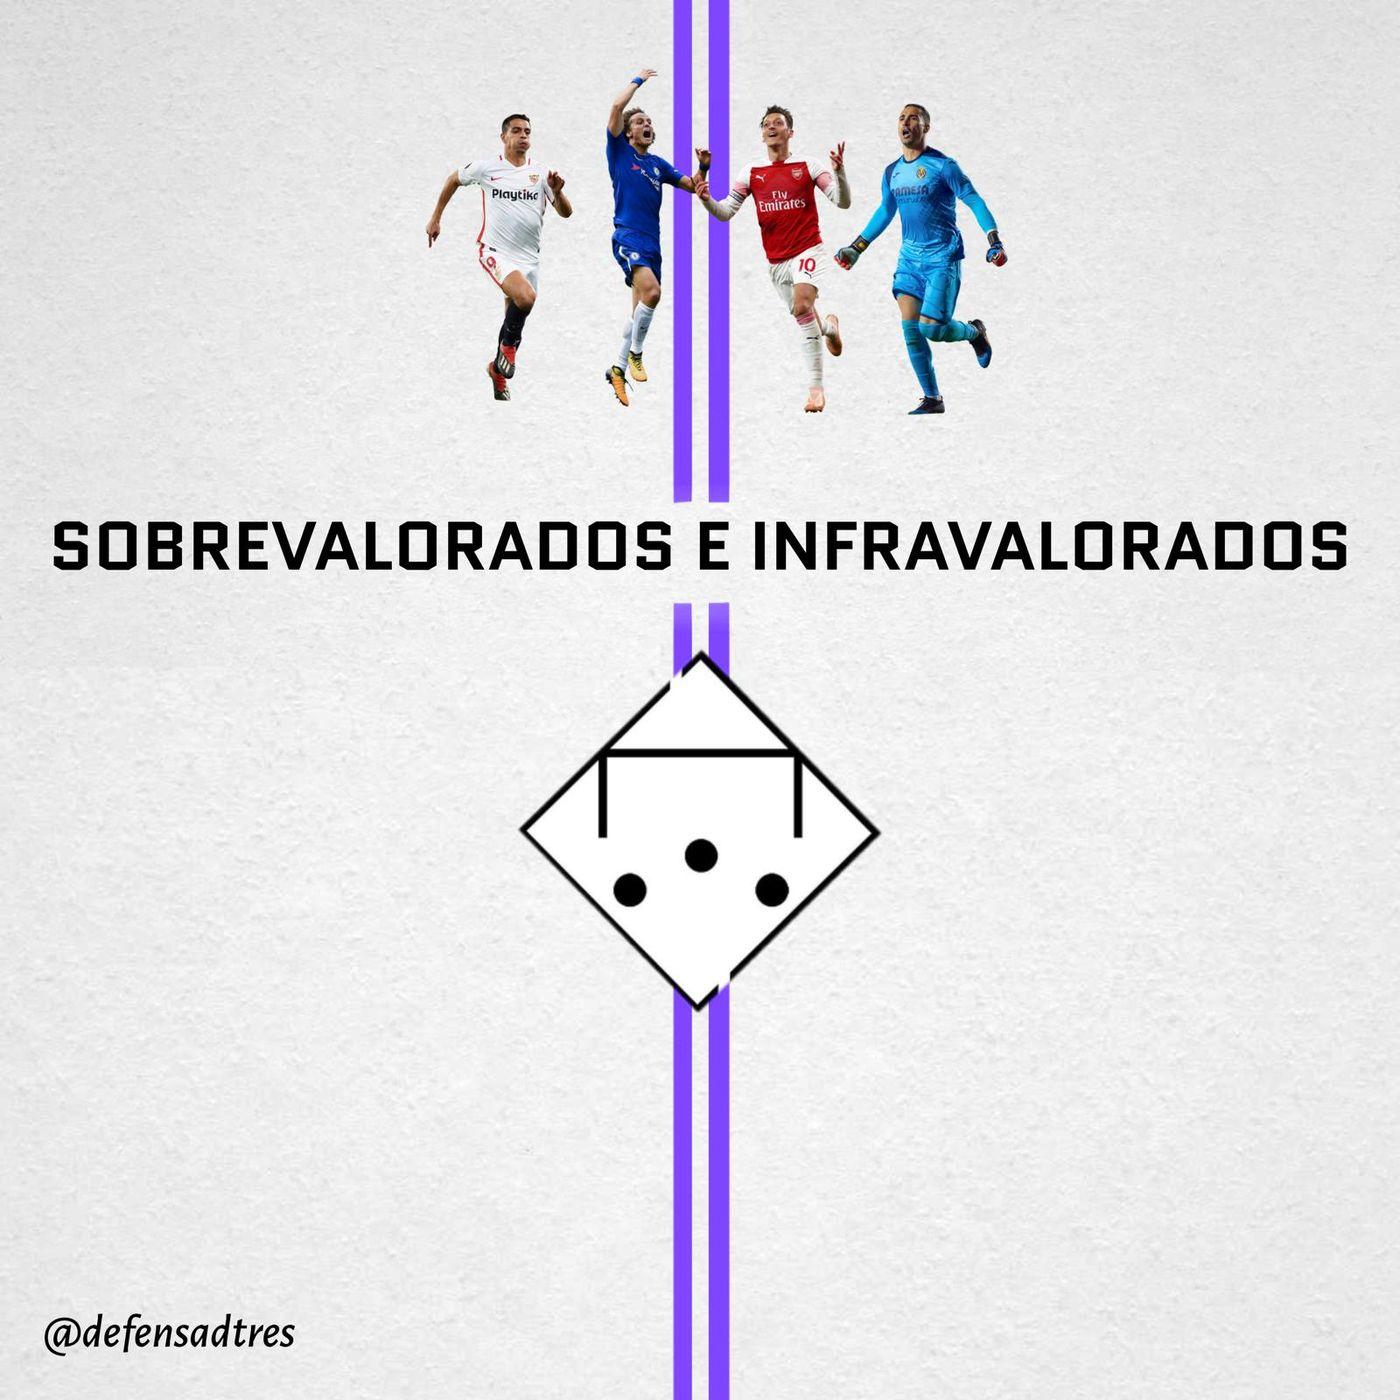 XI SOBREVALORADOS E INFRAVALORADOS - Defensa de Tres 22x01